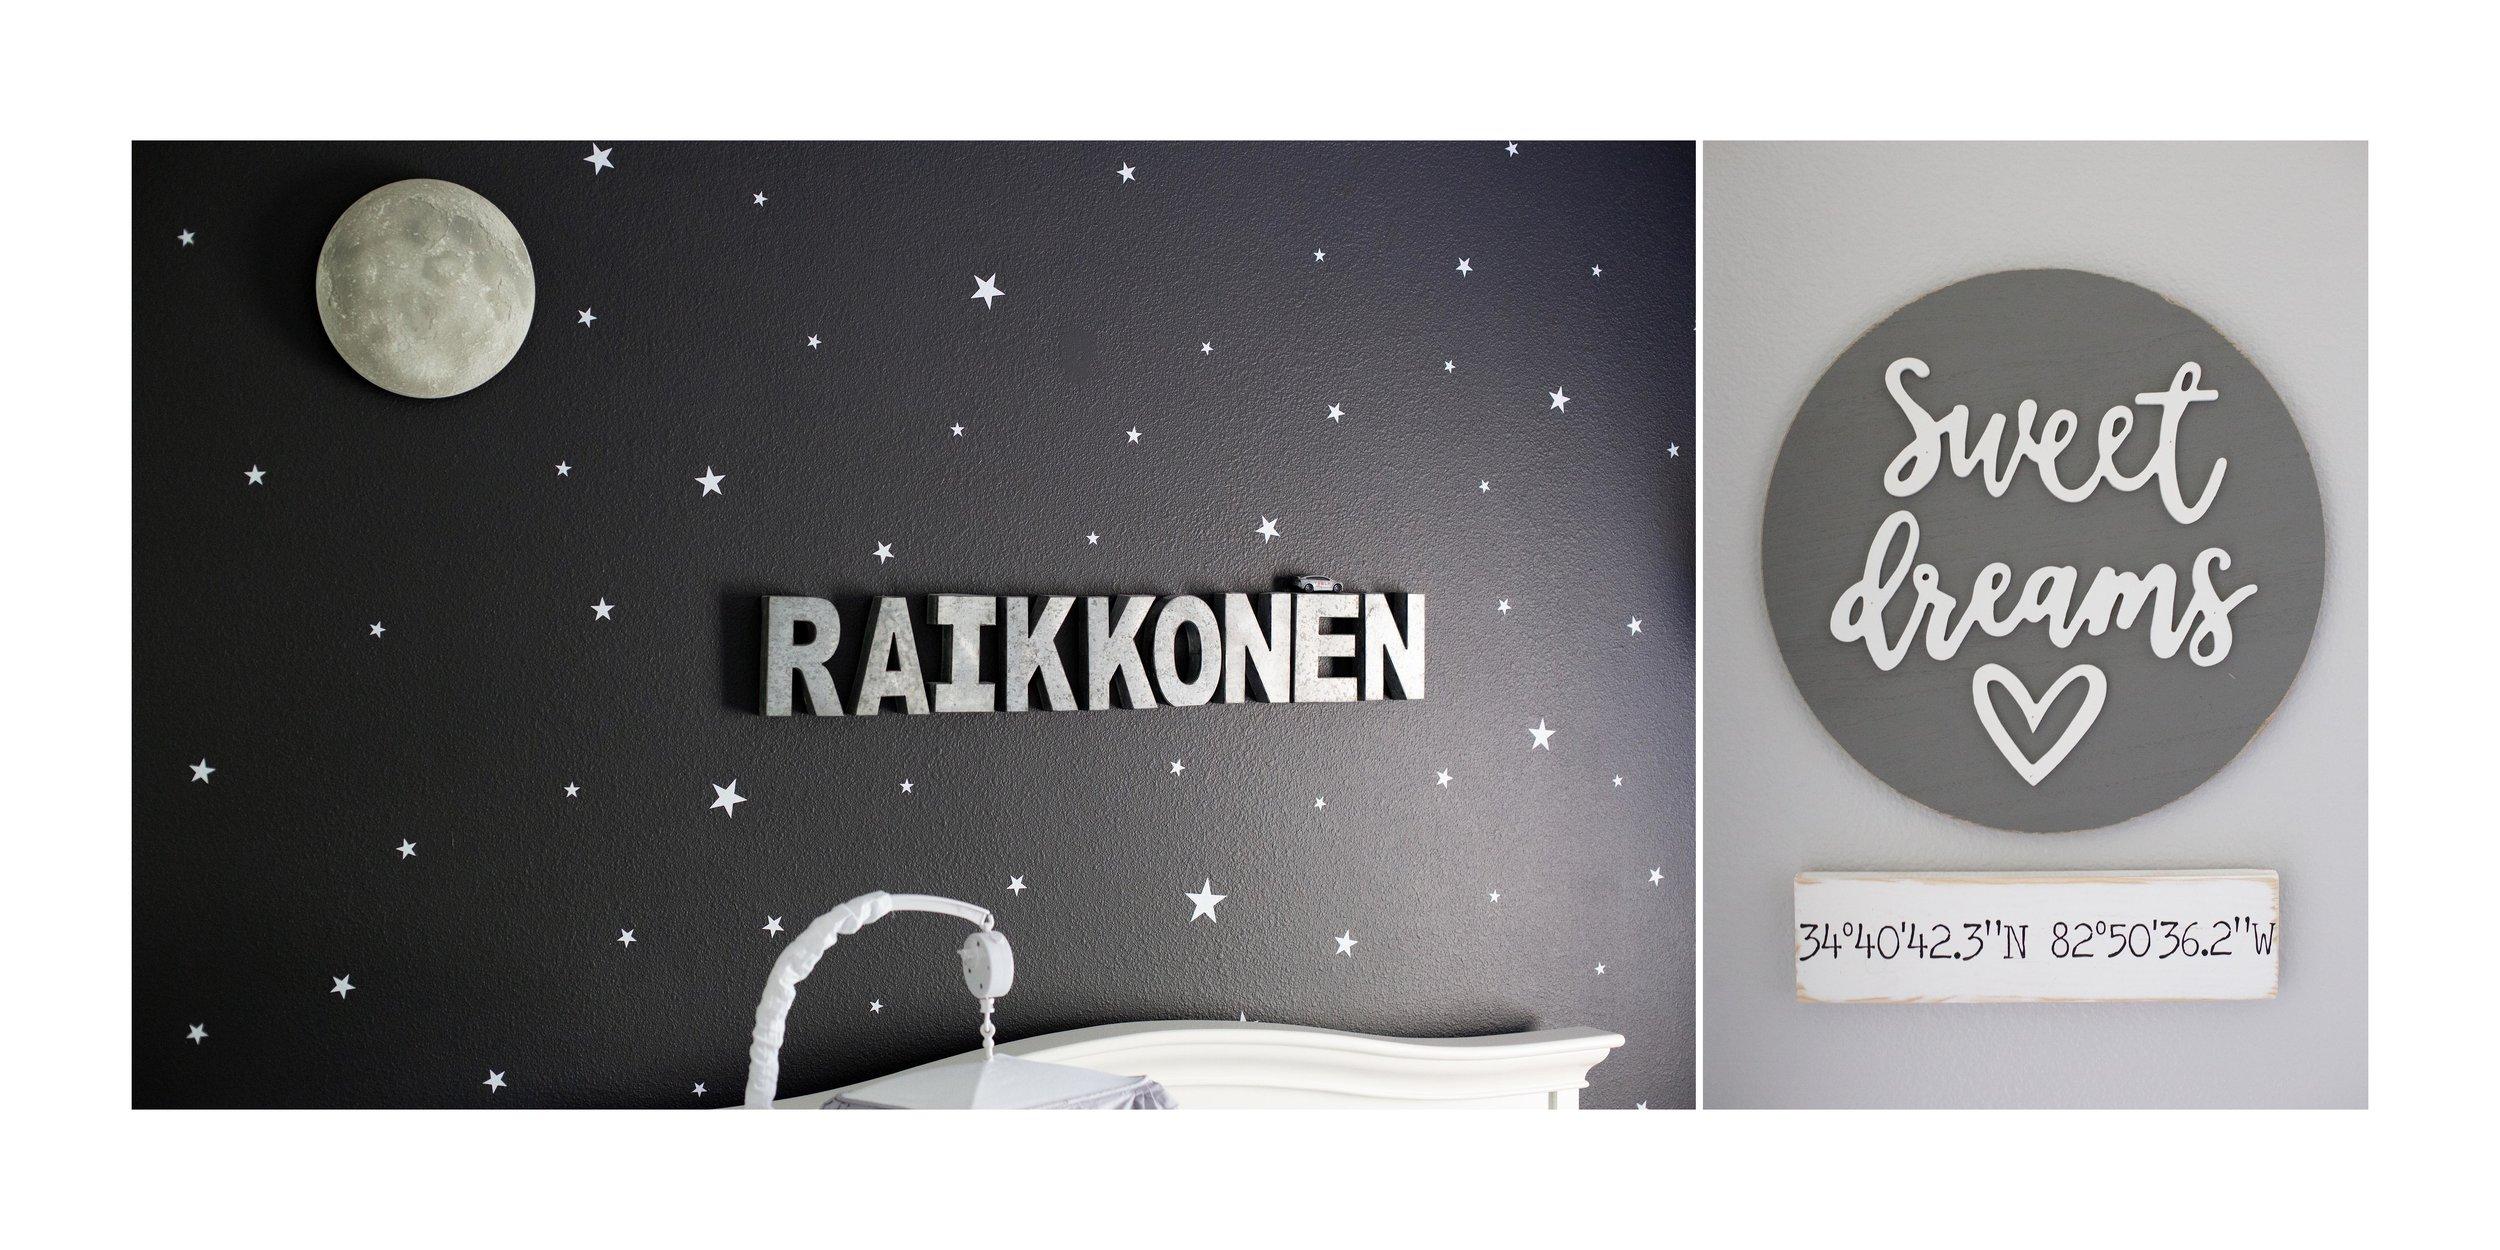 Raikkonen's_room_10_1.jpg